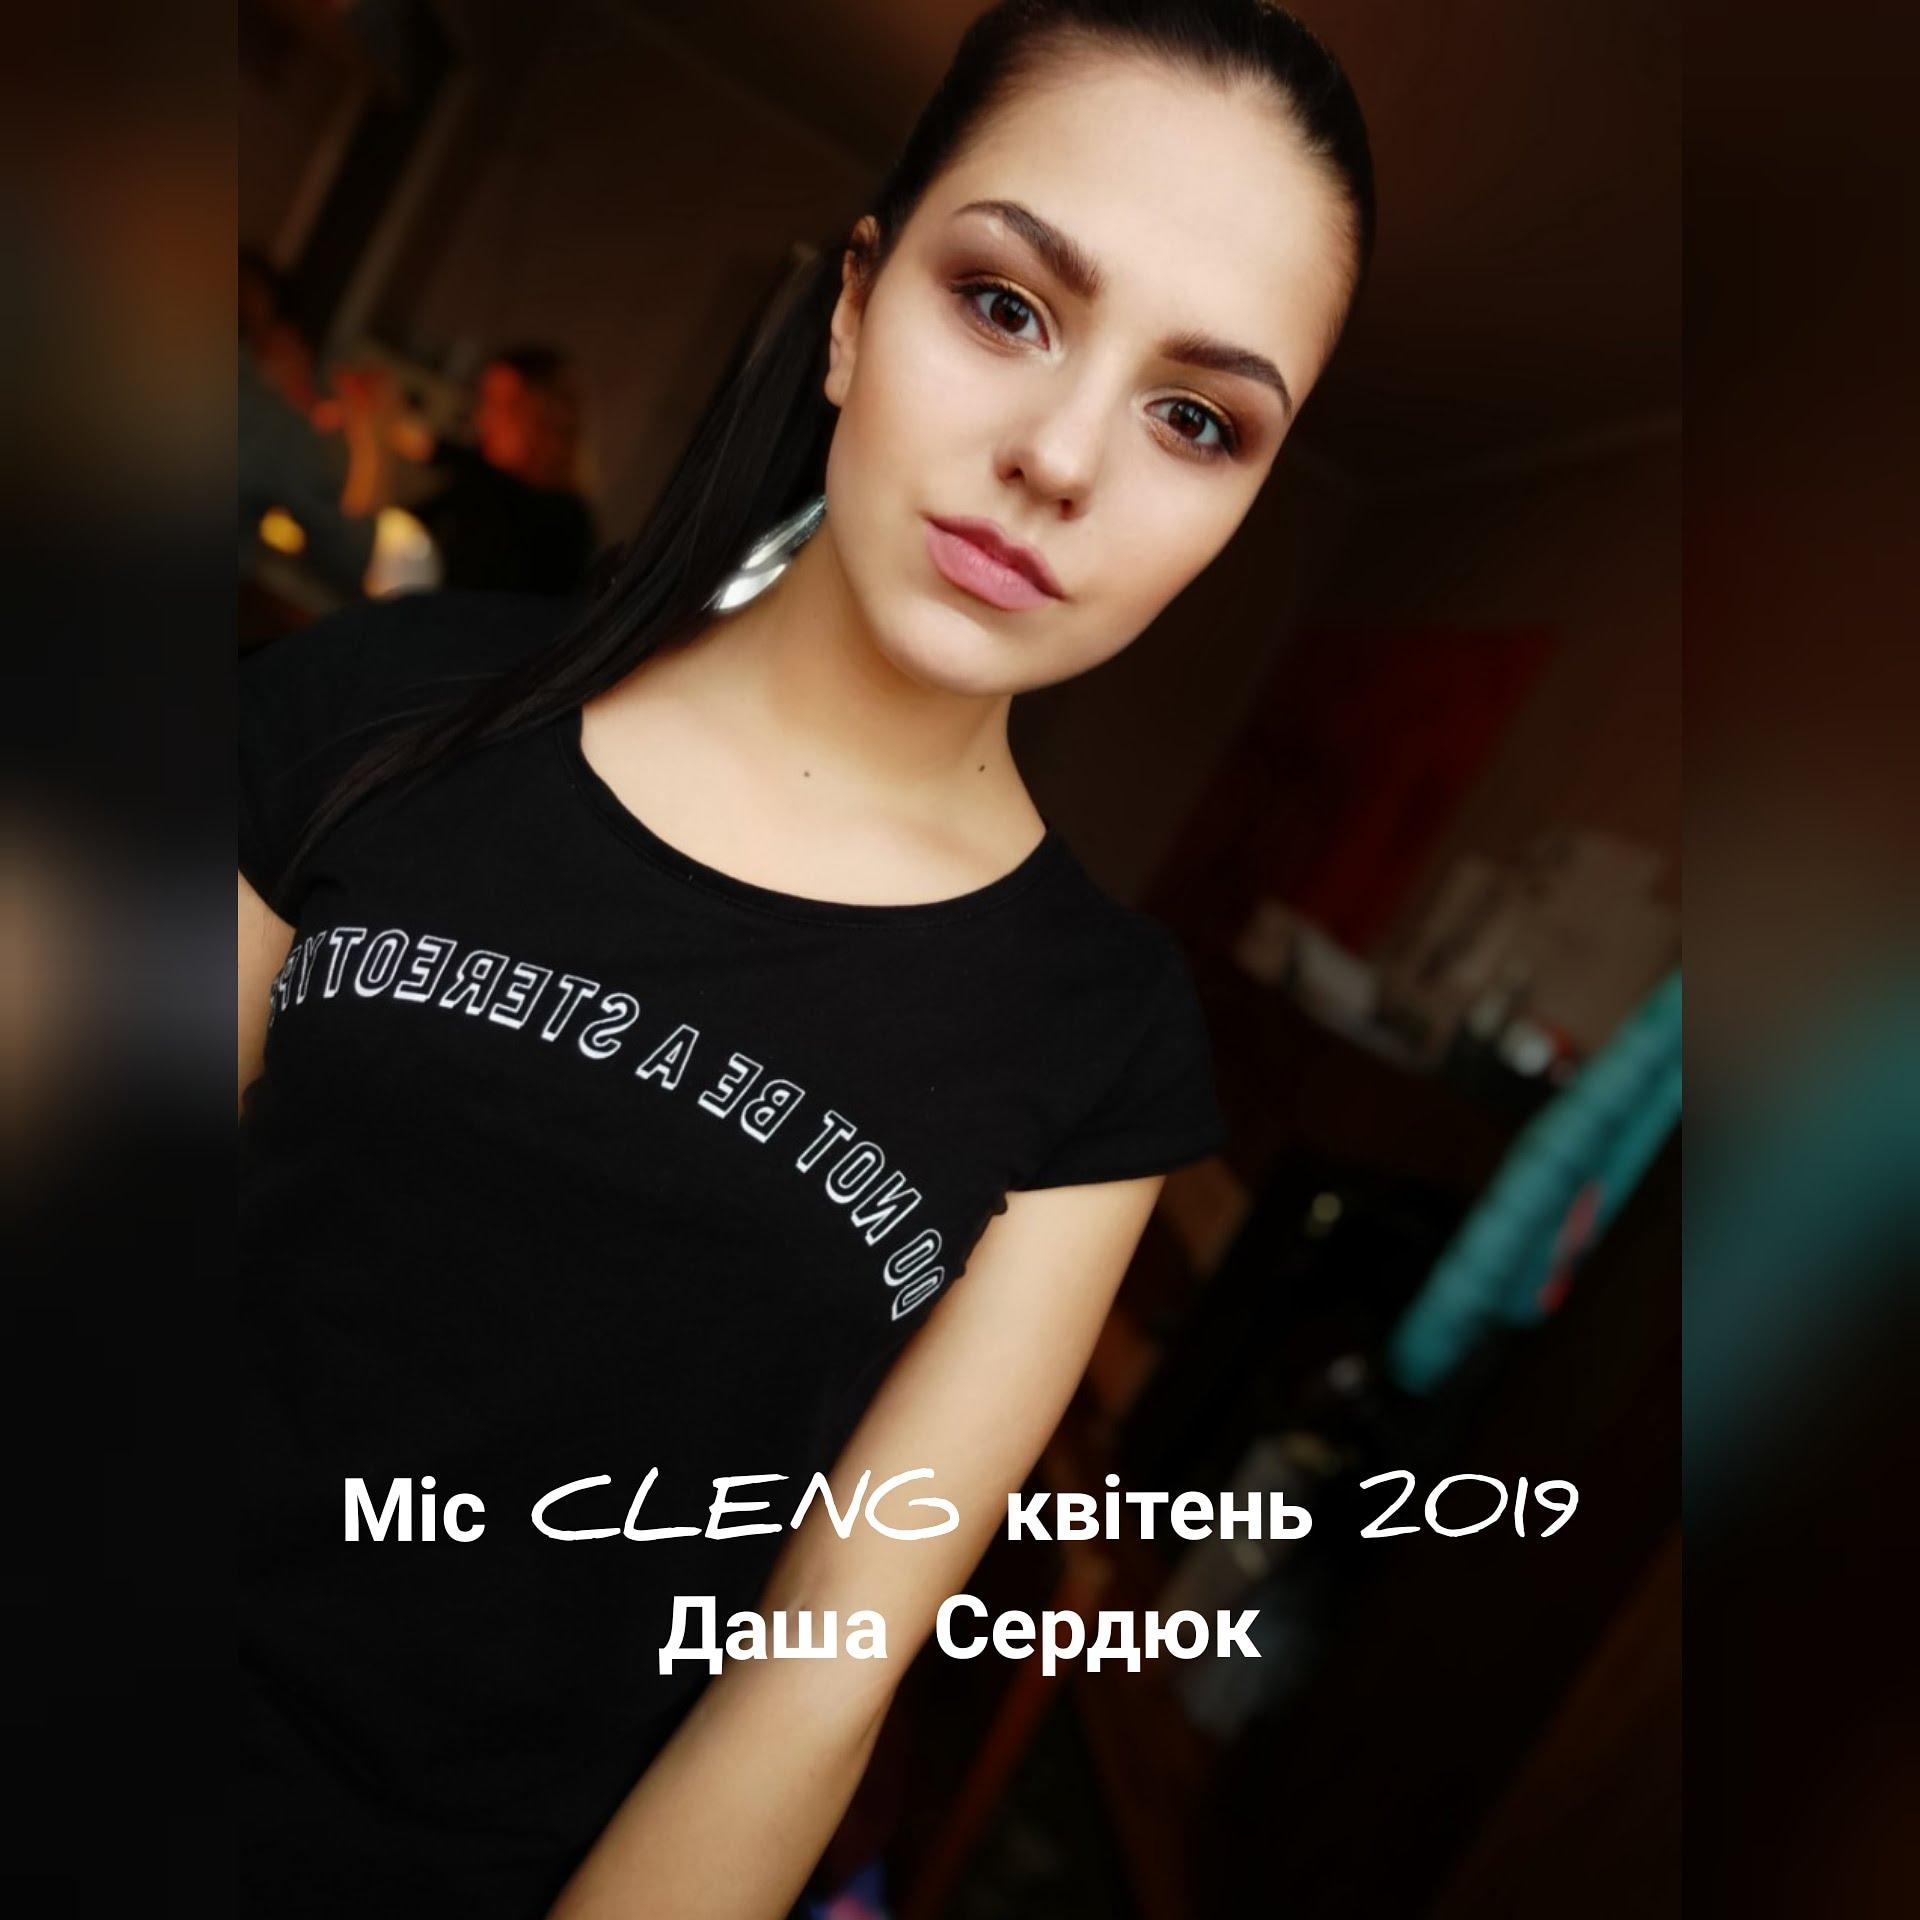 Конкурс Міс CLENG, журнал КЛЕНЖ, хеаглобе, Тимур Уваровит, Даша Сердюк